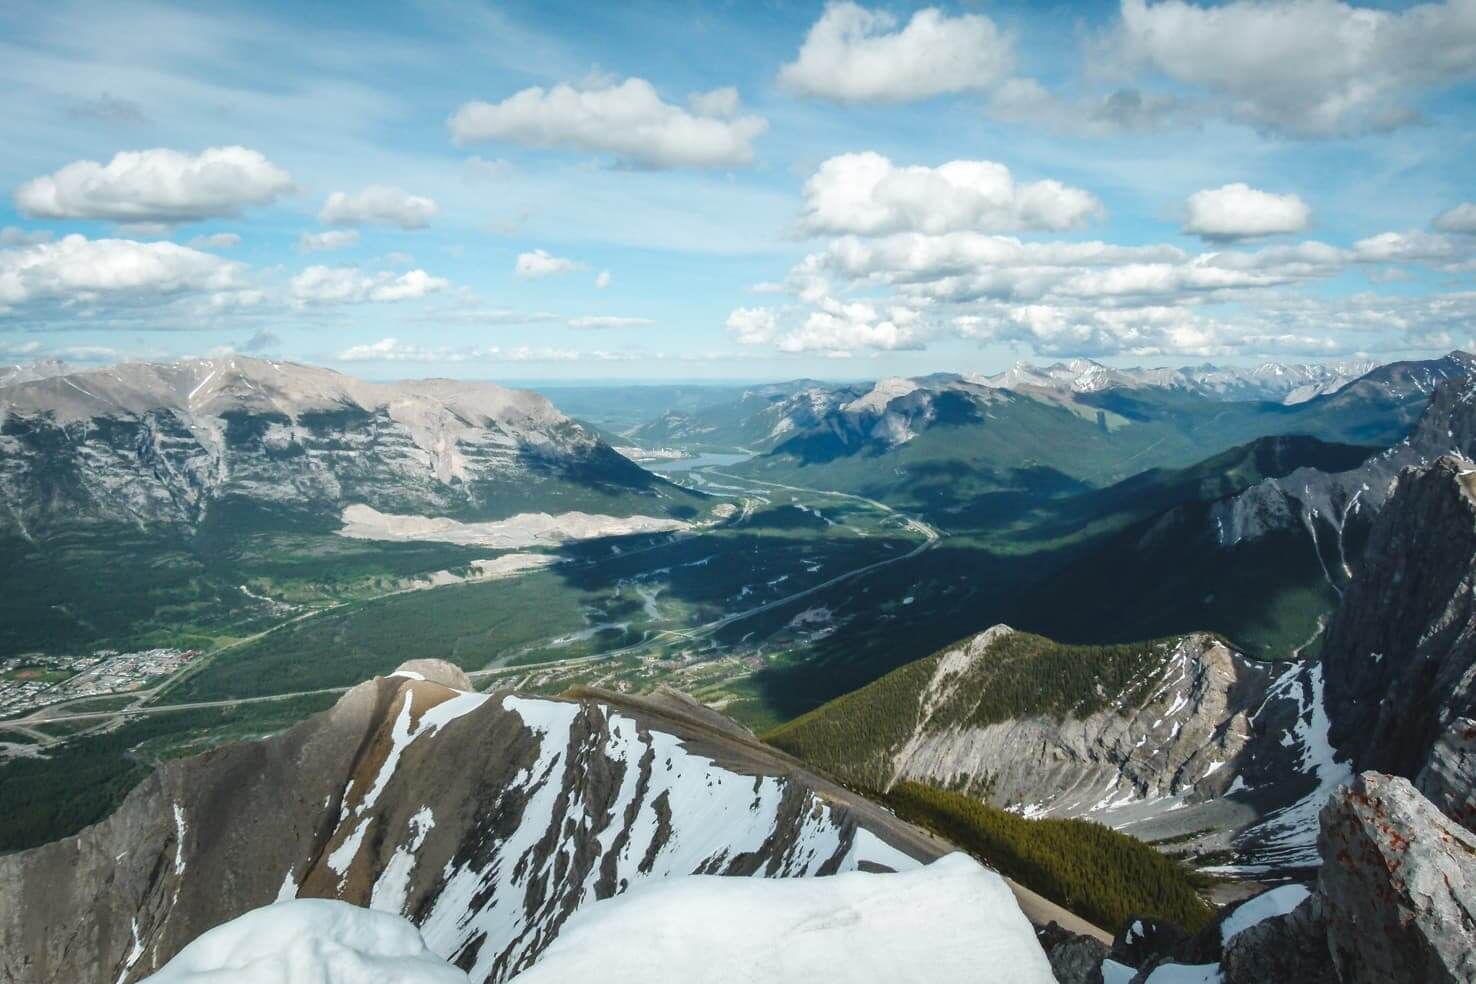 Ha Ling Peak Hike vs Mount Lawrence Grassi